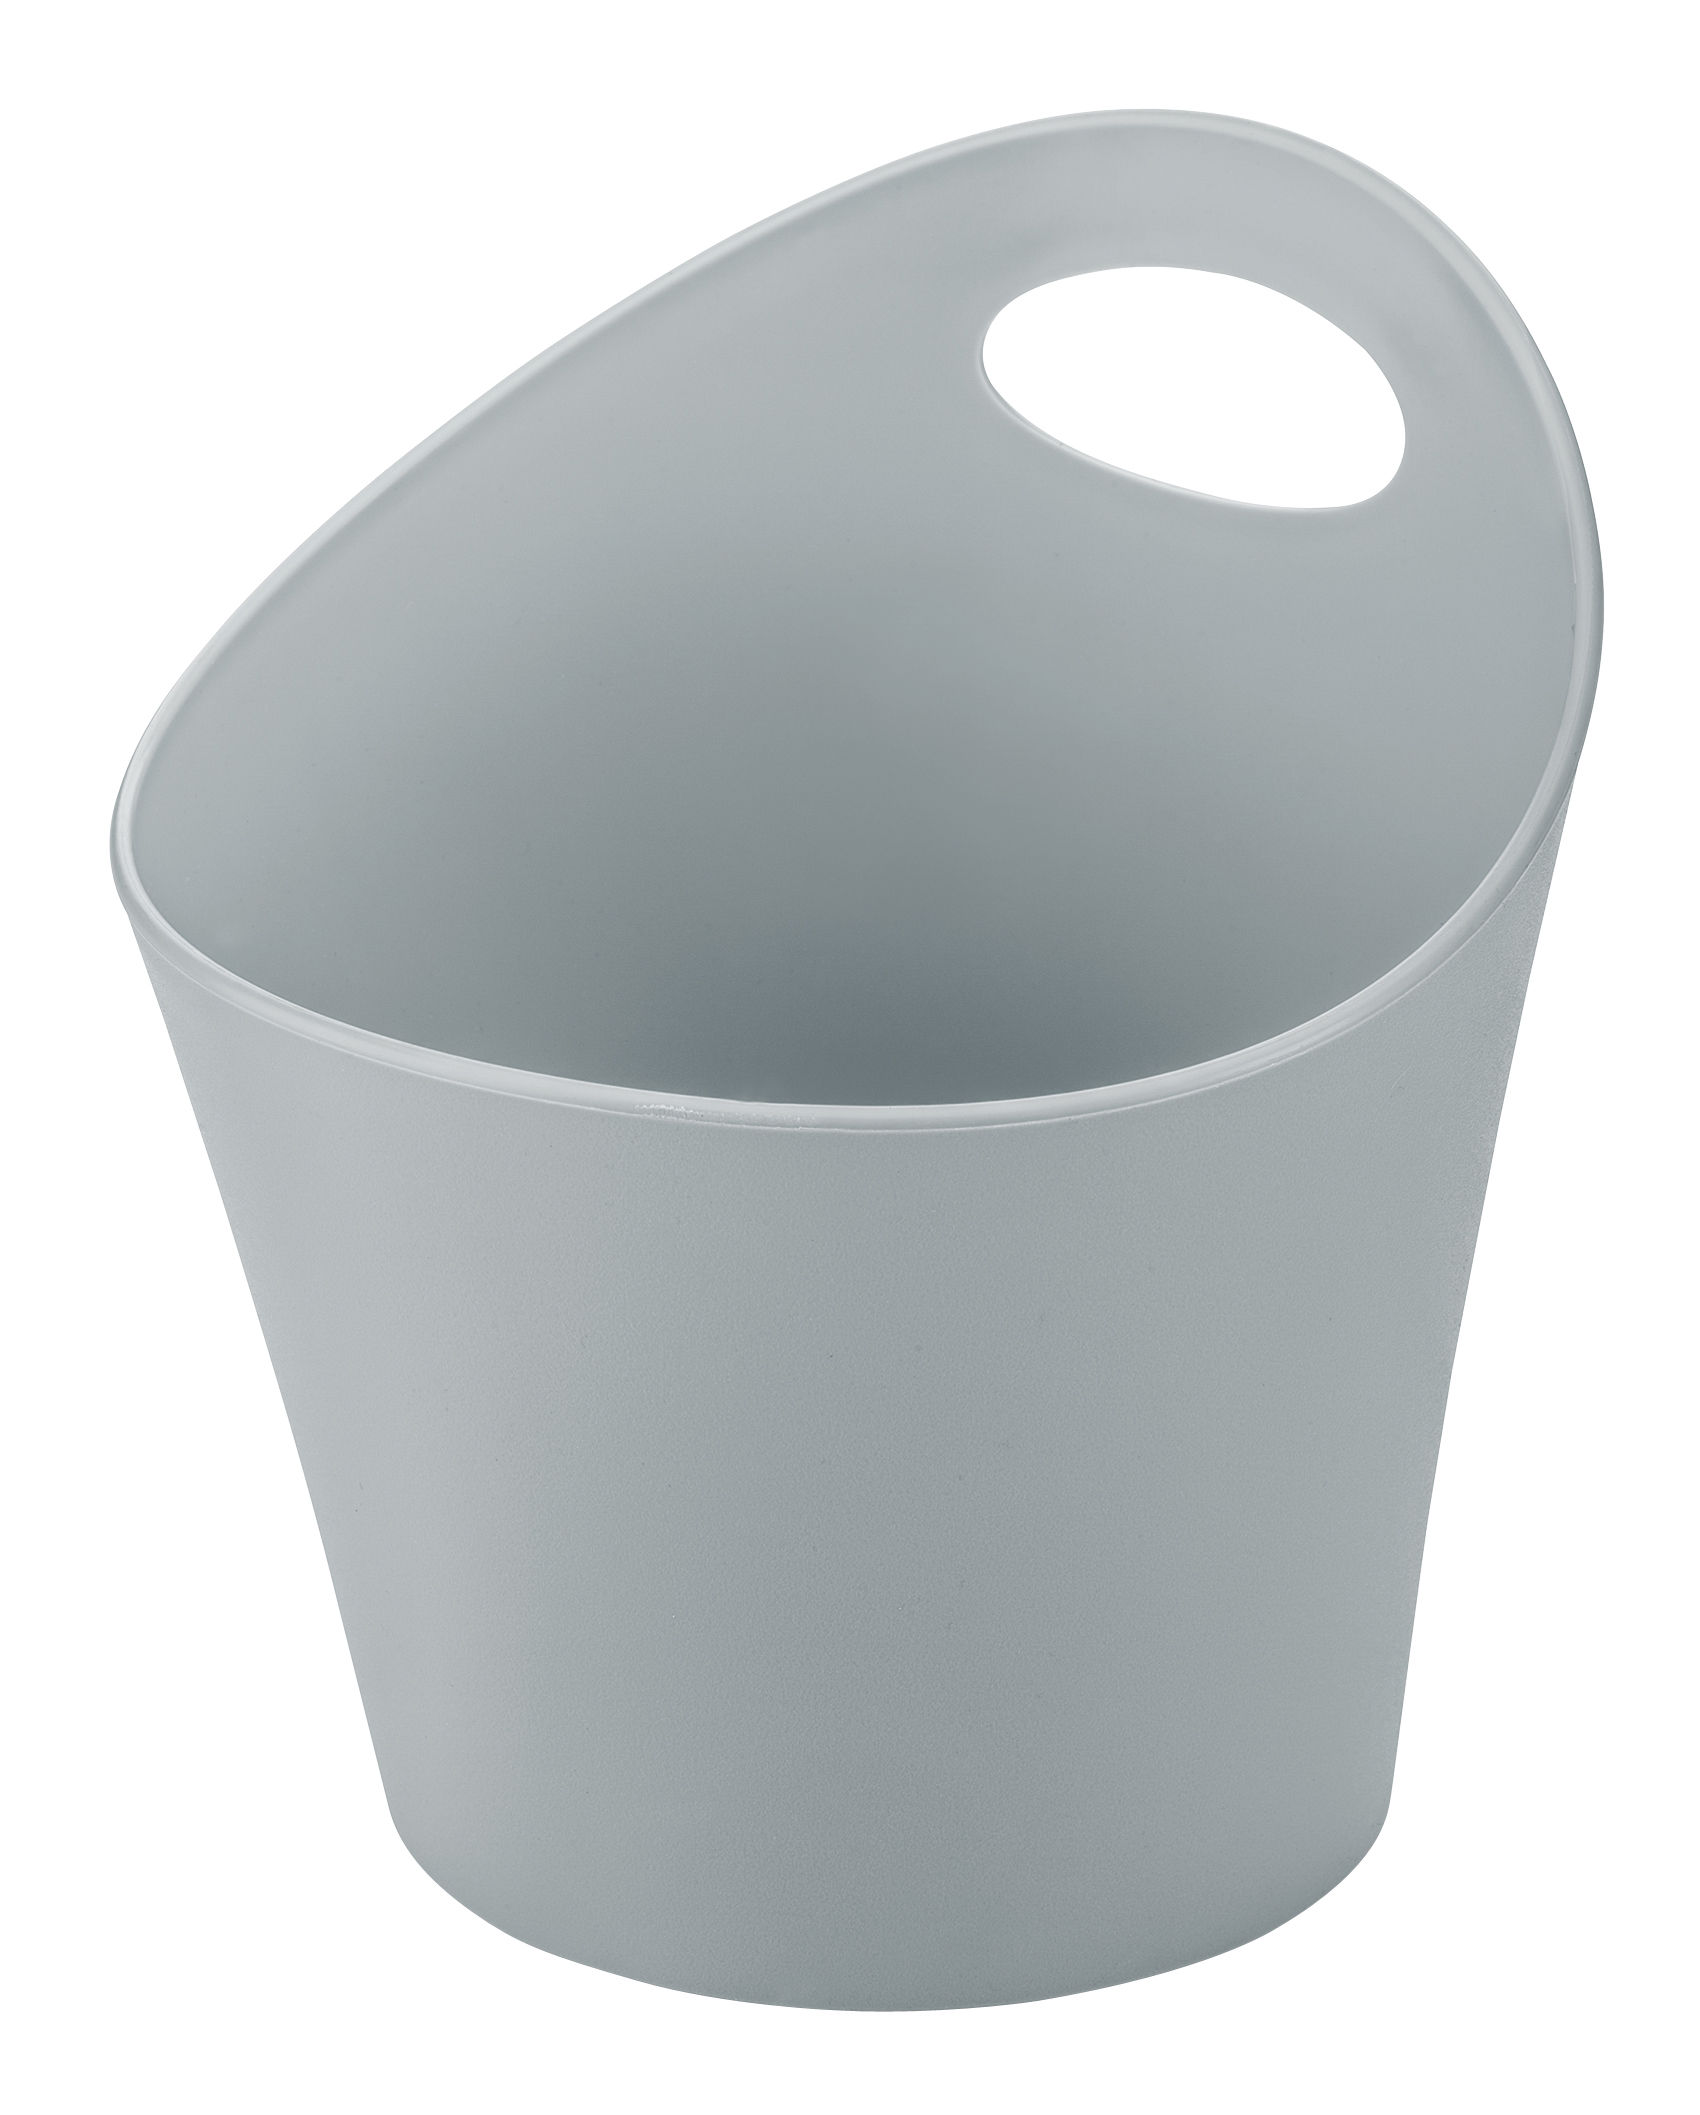 Outdoor - Pots & Plants - Pottichelli M Pot by Koziol - Solid light grey - PMMA